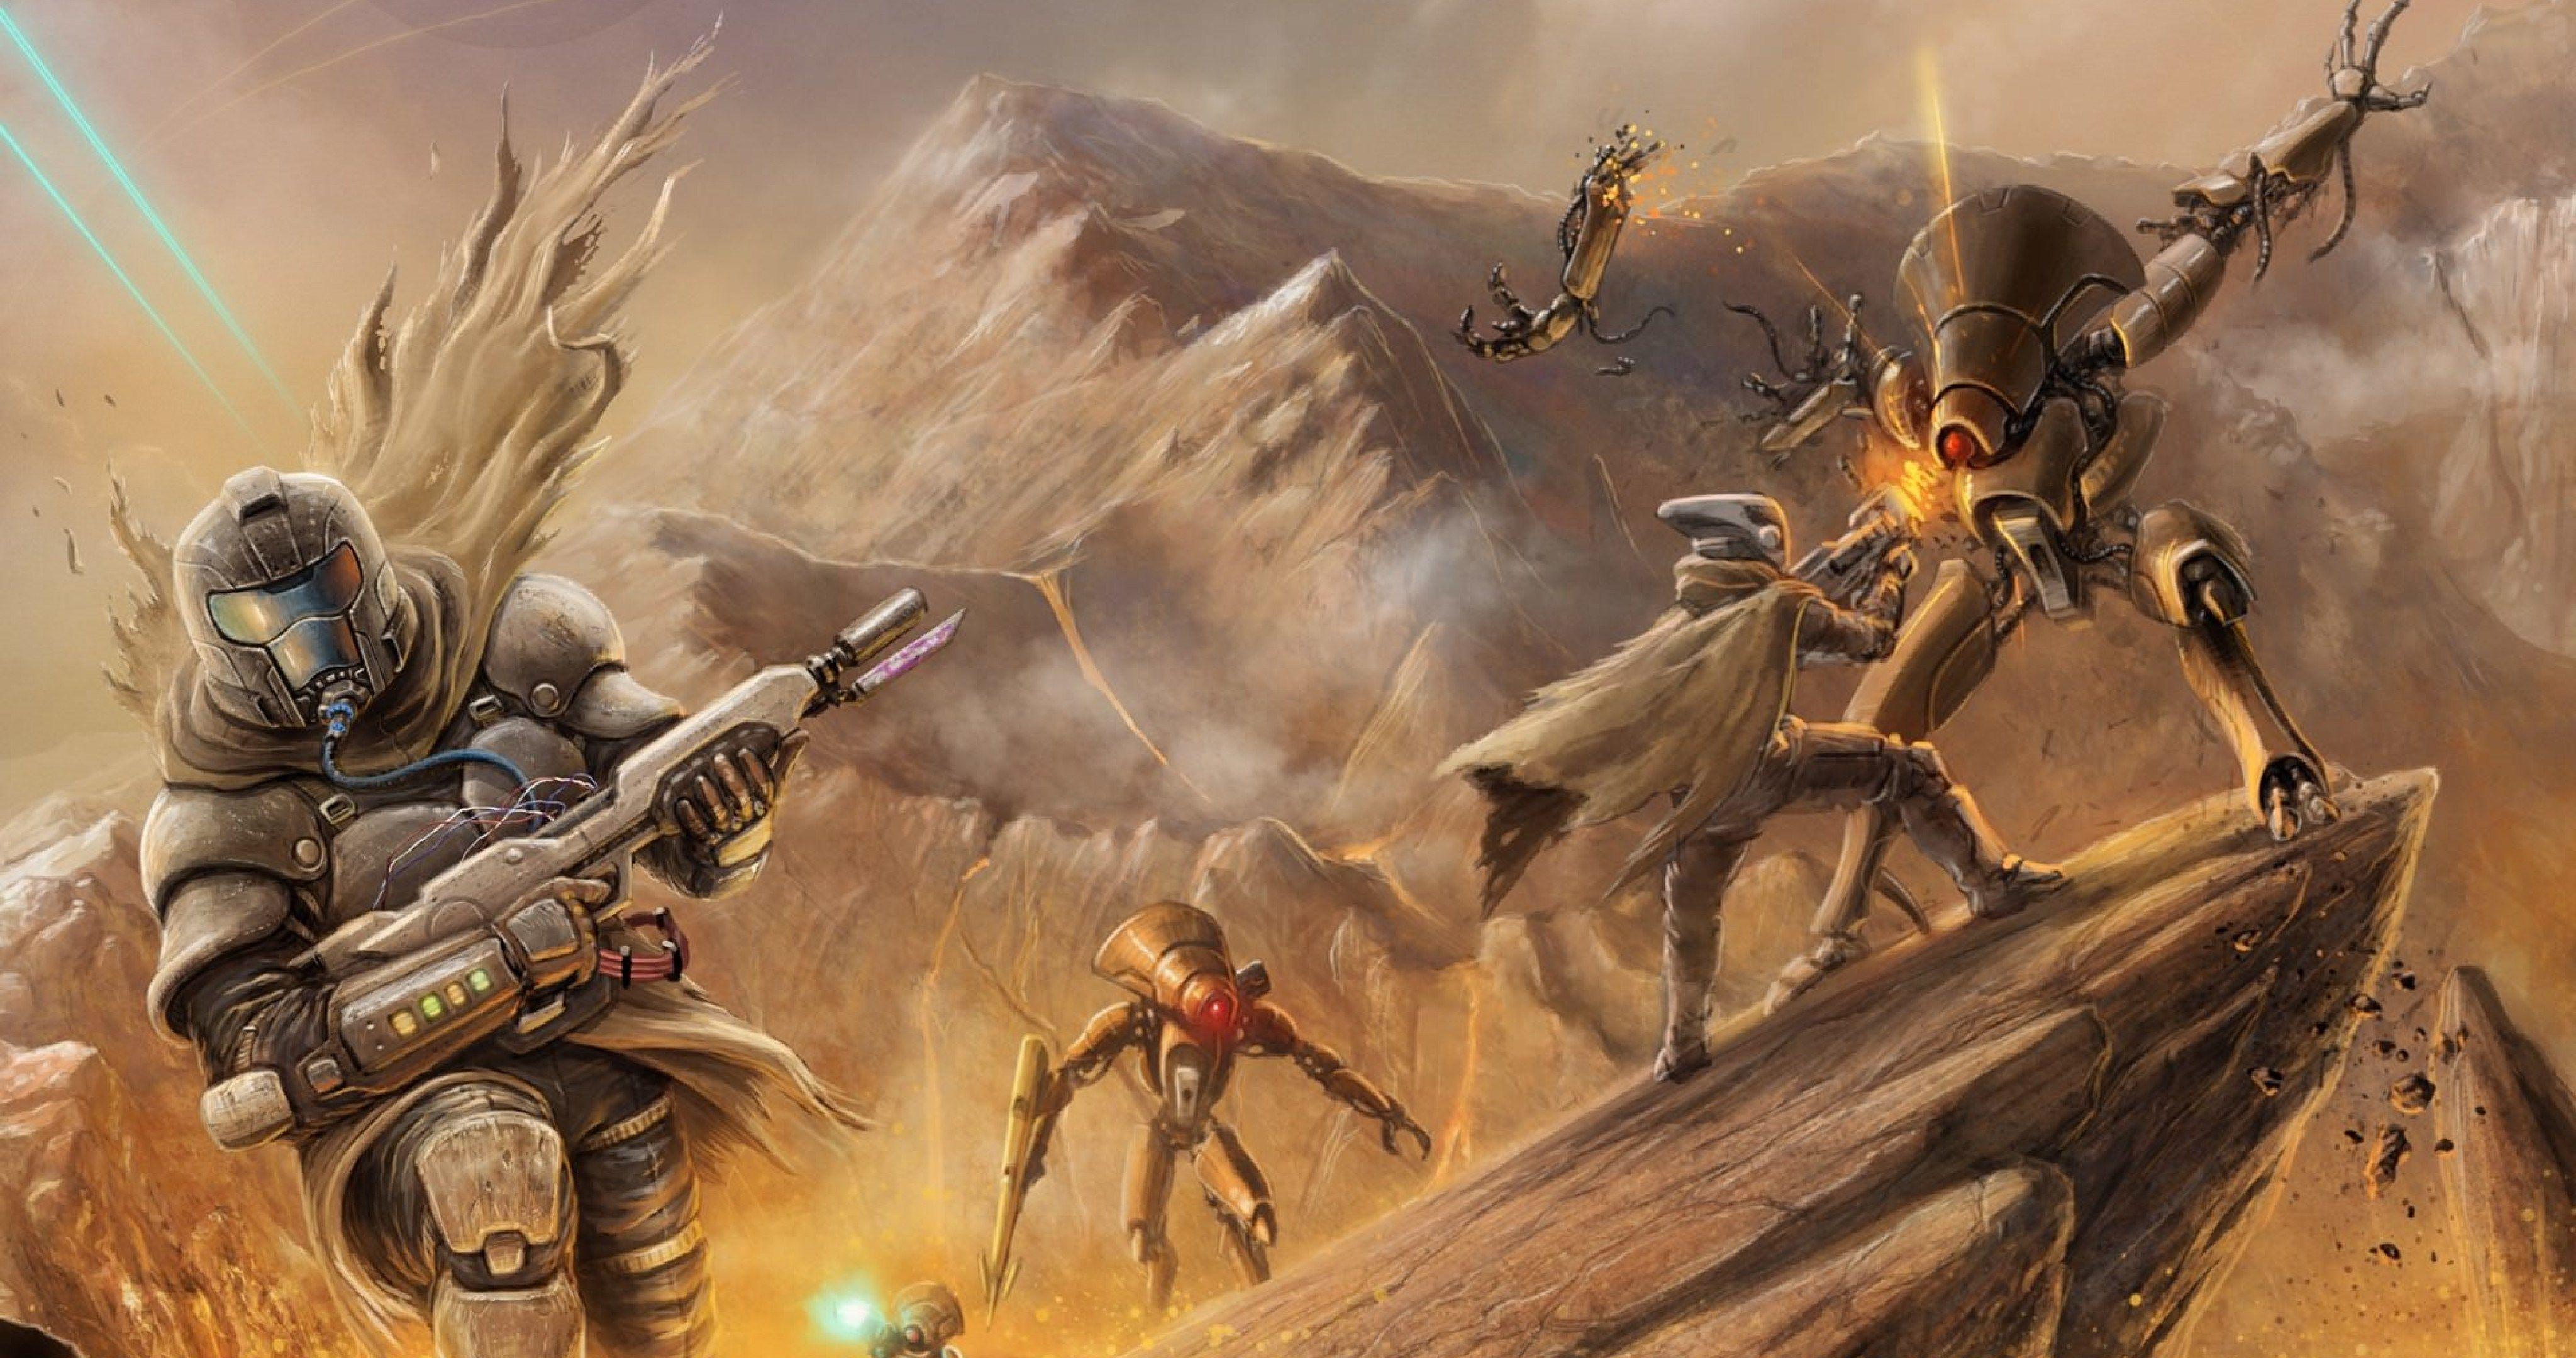 Destiny Game 4k Ultra Hd Wallpaper Destiny Game Destiny Bungie Fan Art